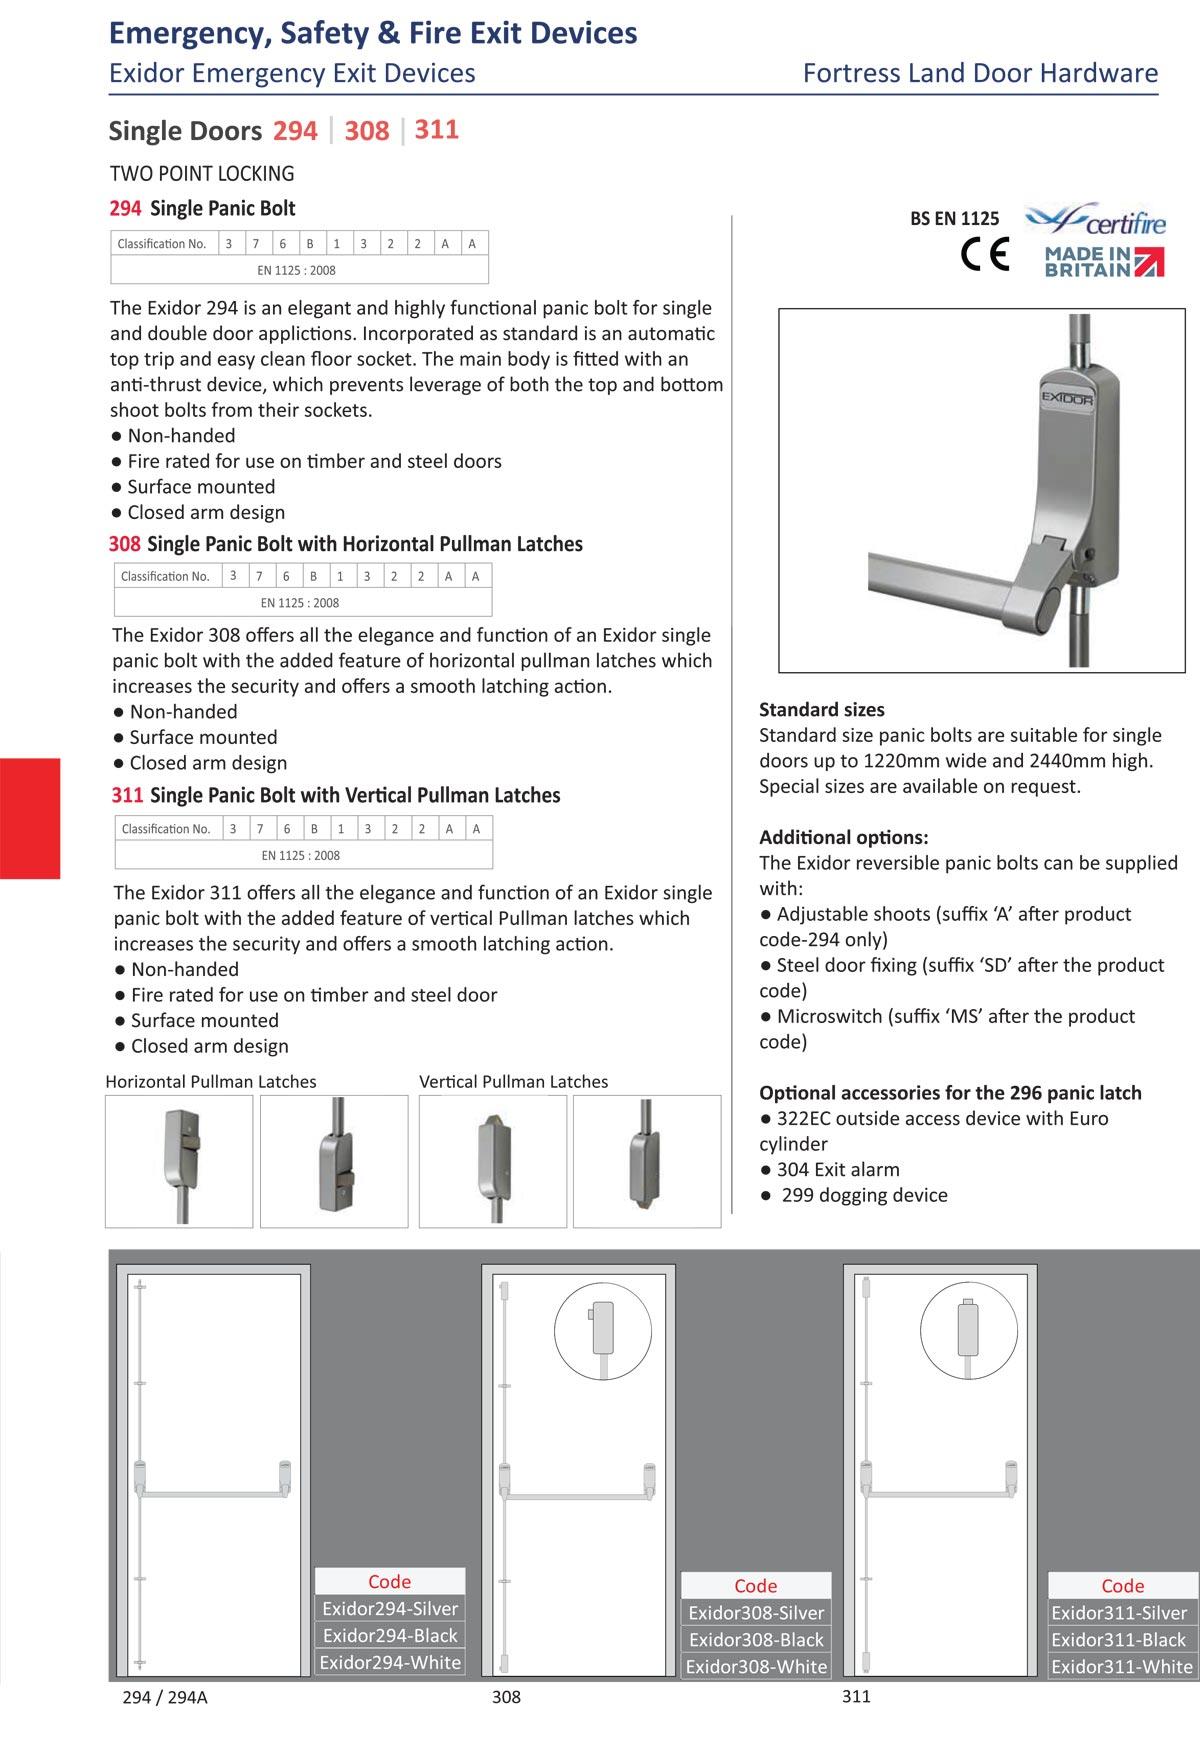 exidor emergency exit device, emergency exit door, fire exit door, escape door, horizontal exit device, vertical exit device, surface mounted exit device, Fortress Land Security Company Yangon, Myanmar